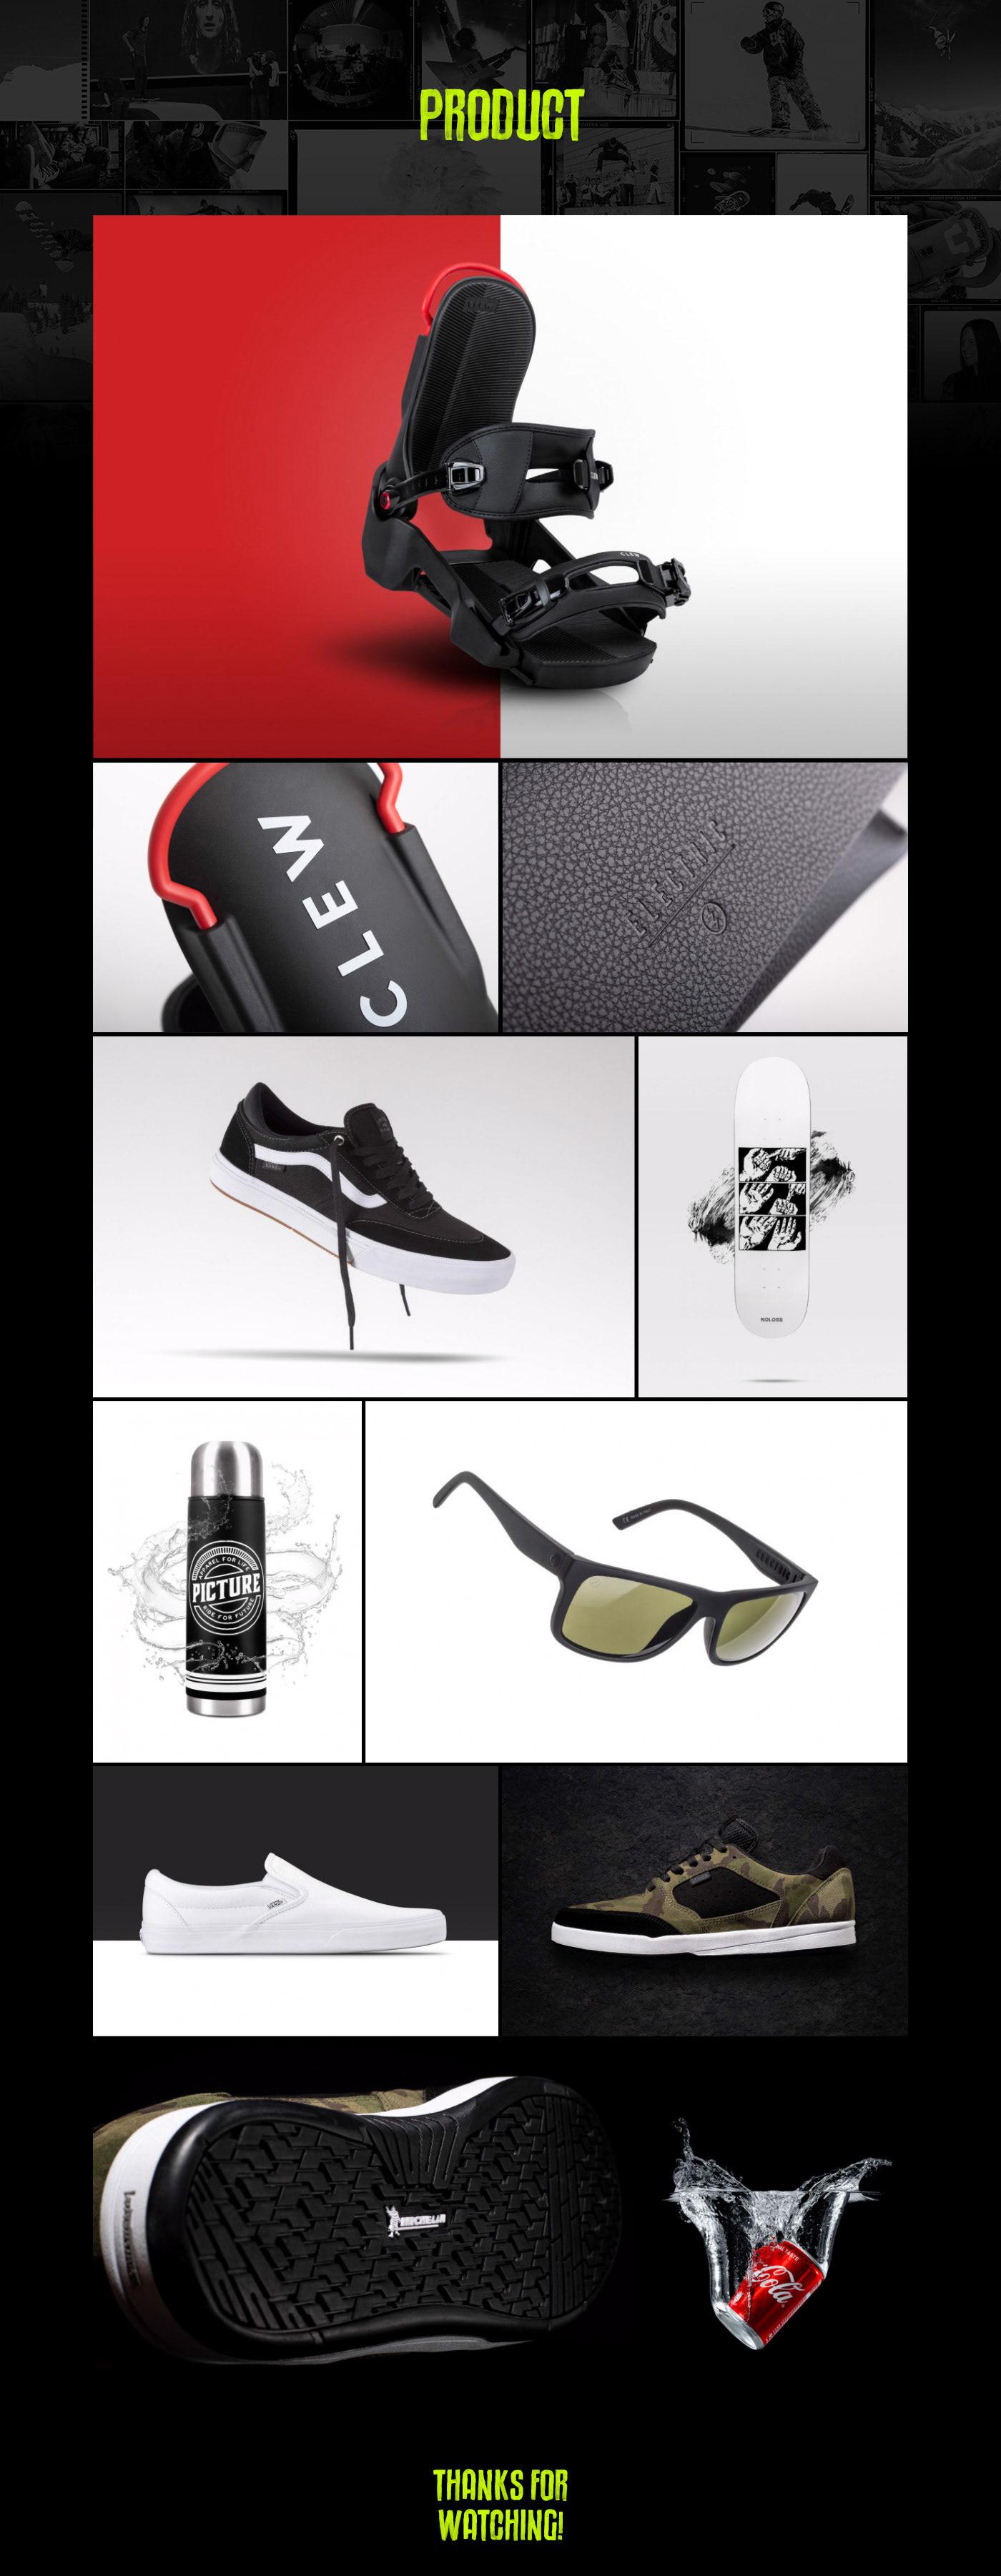 closeup details Photography  product Gear lifestyle skateboard snowboard Sunglasses skateshoes